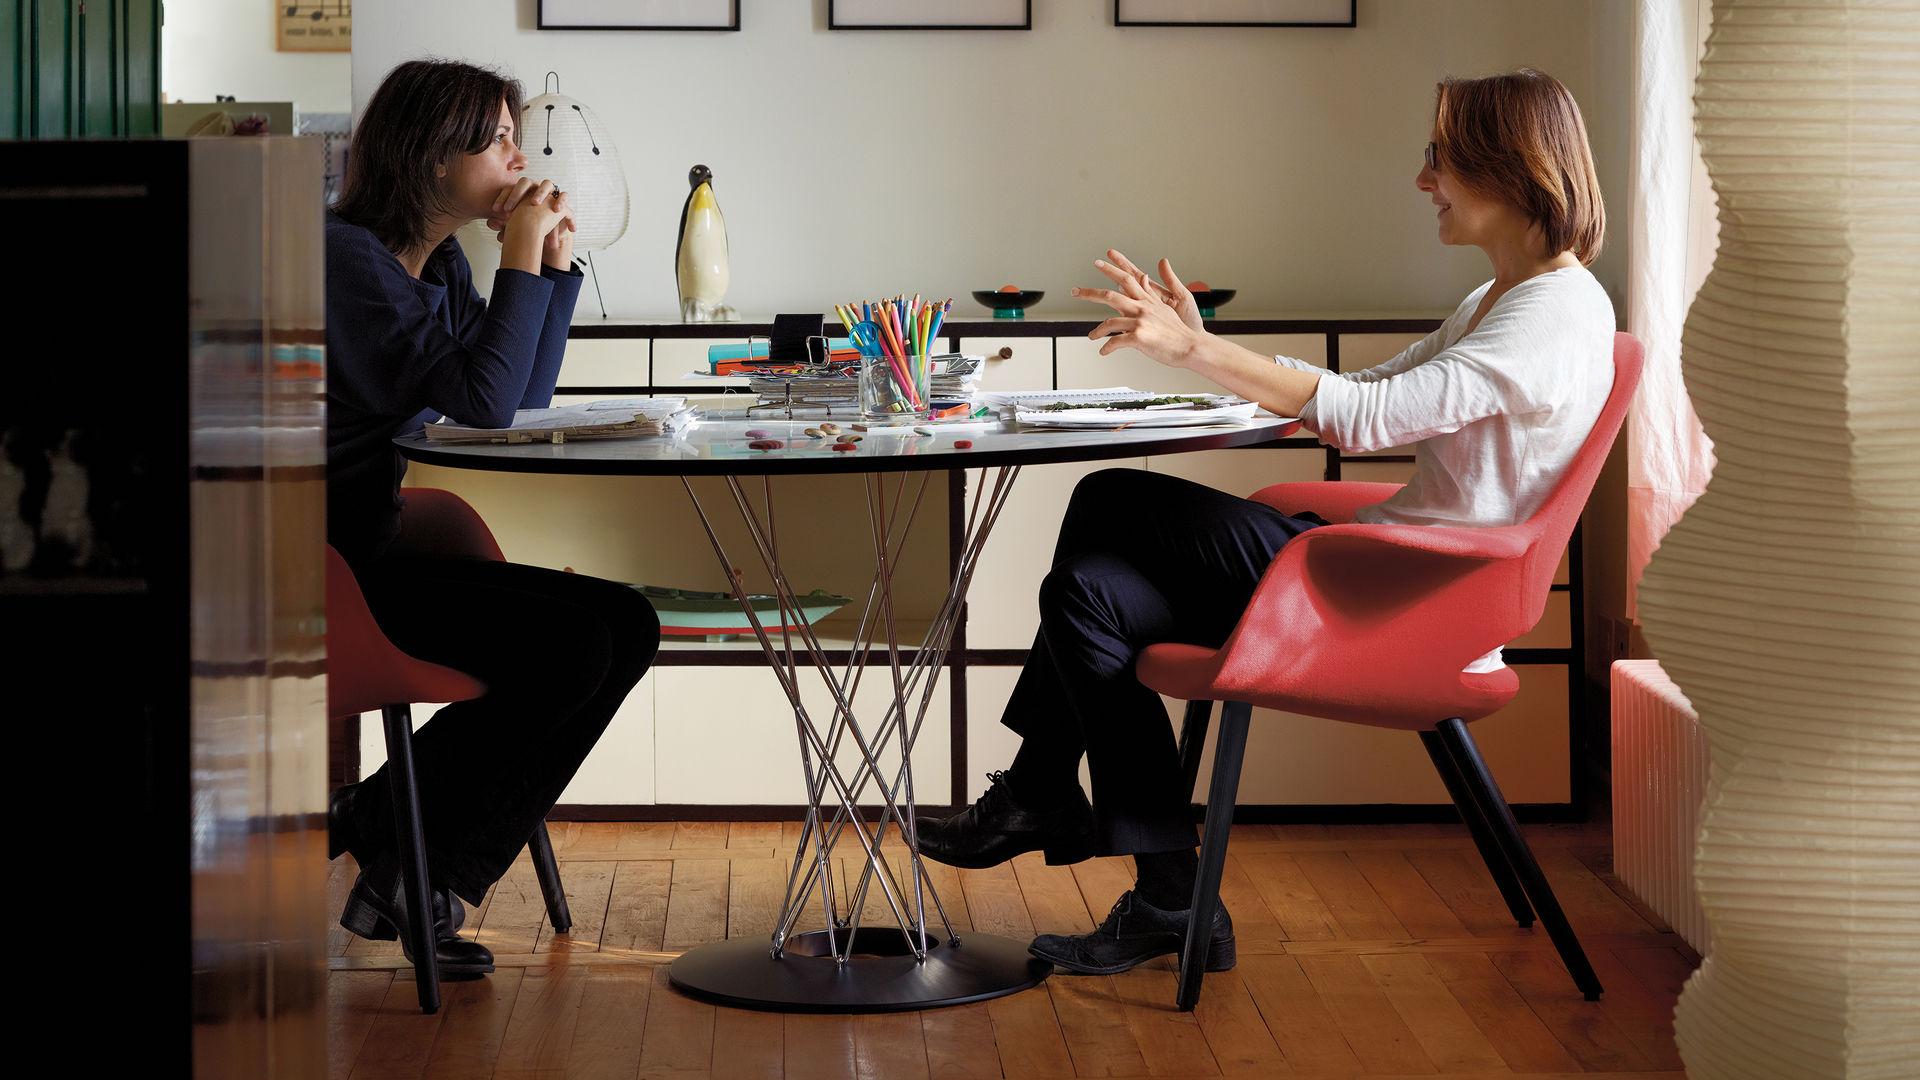 Organic Chair Dining Table Akari 1AD_web_16-9